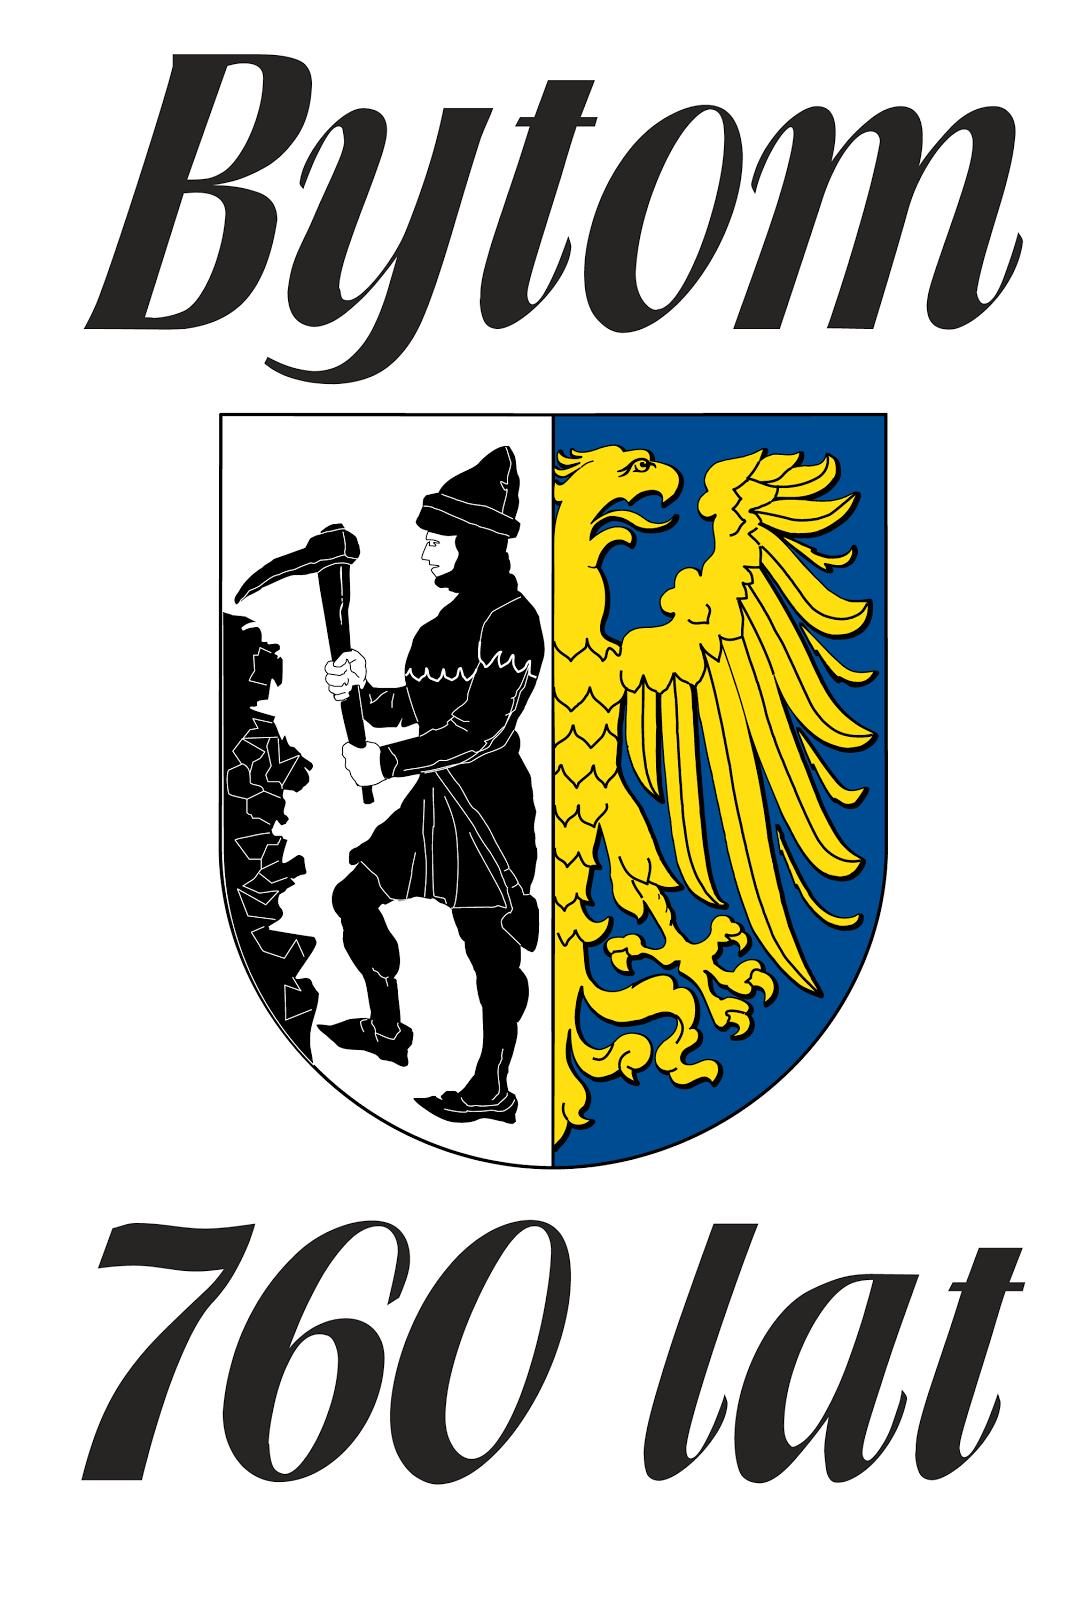 http://www.bytom.pl/